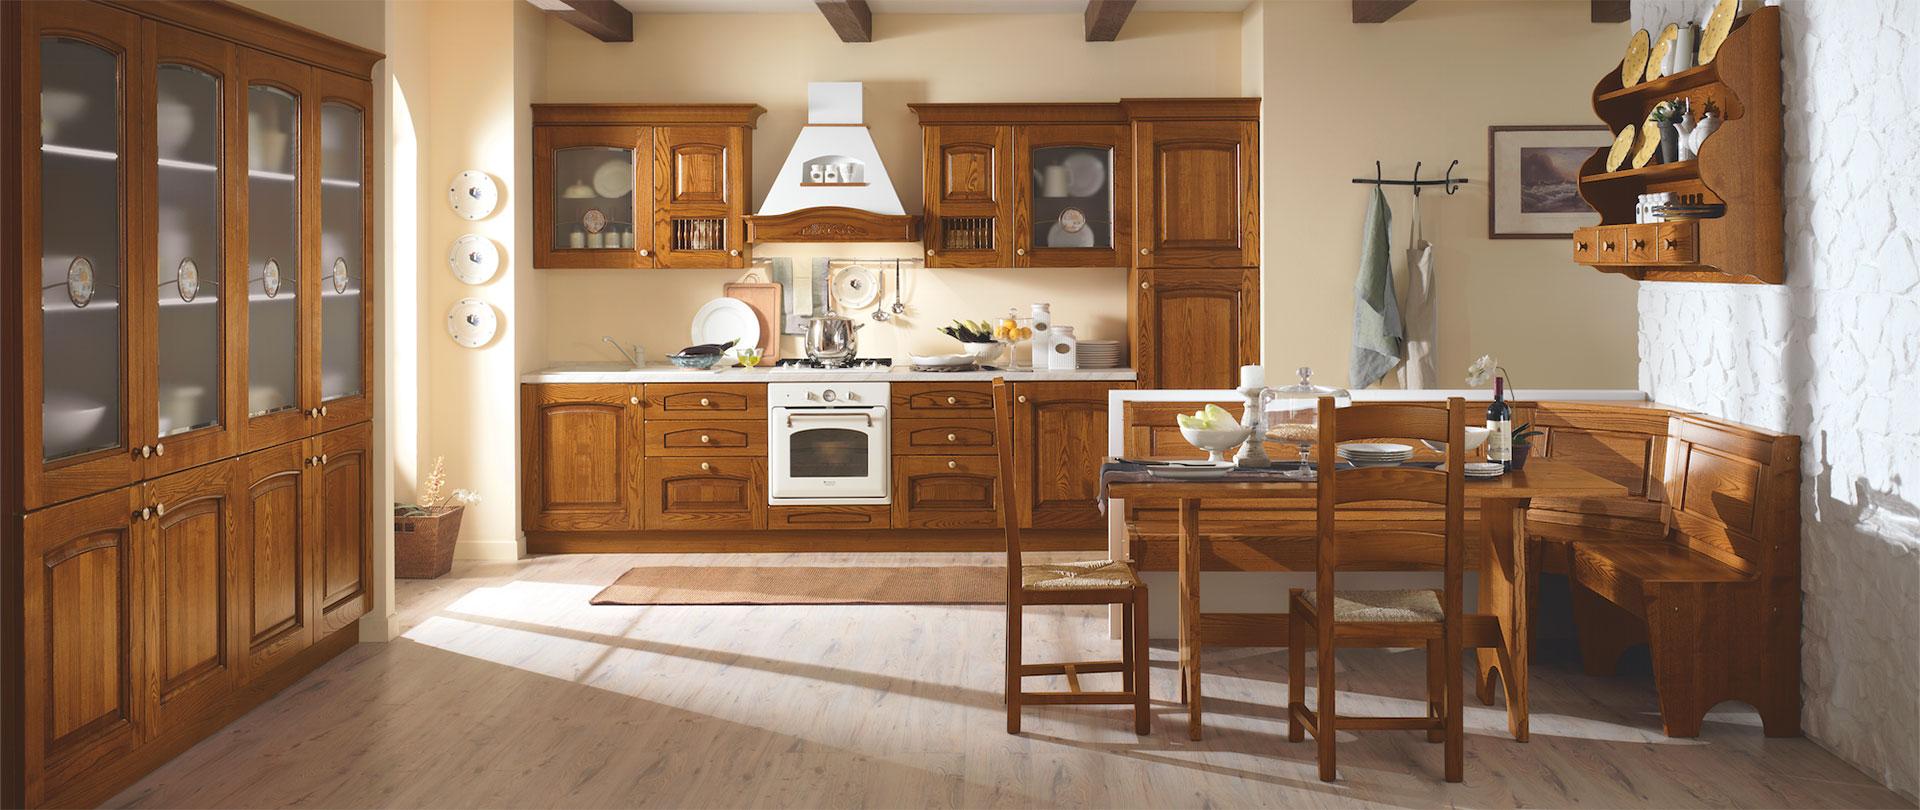 Cucine classiche cucinissima for Cucine di pregio